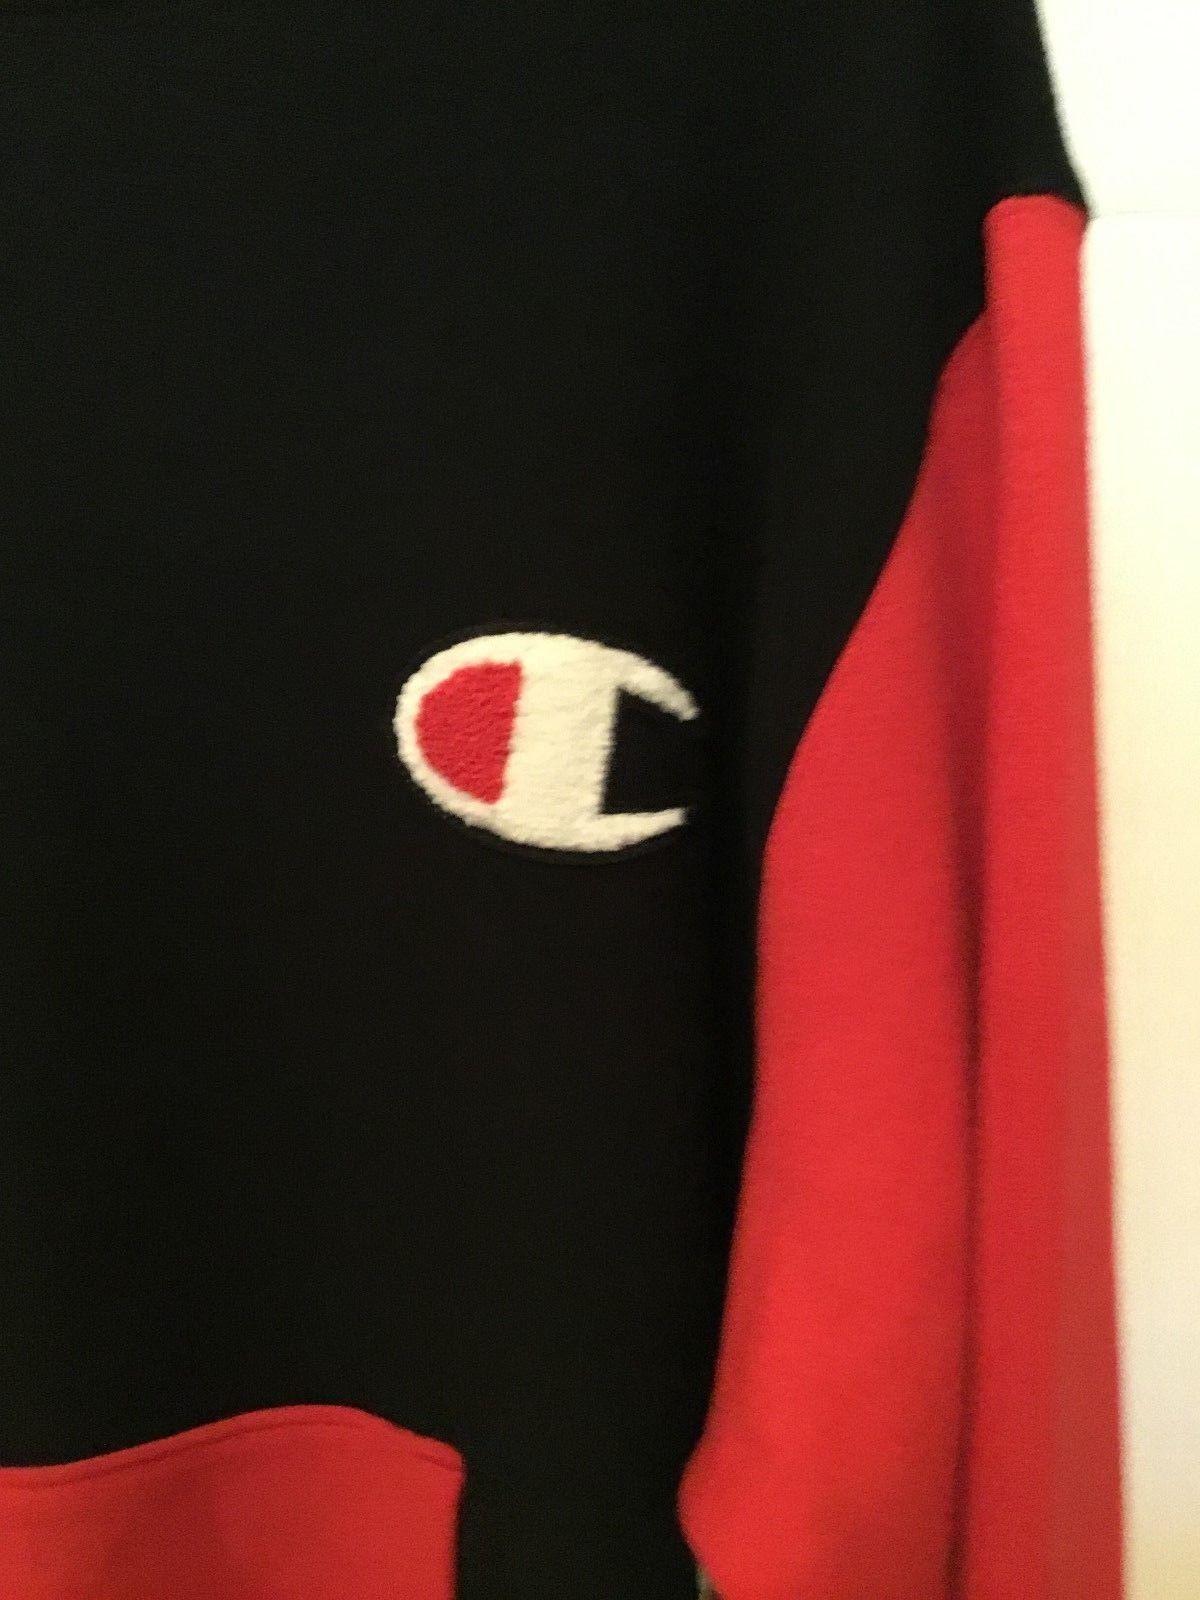 Champion Reverse Weave Red & Black Sweatshirt Crewneck L Multi Color Logo/Pocket